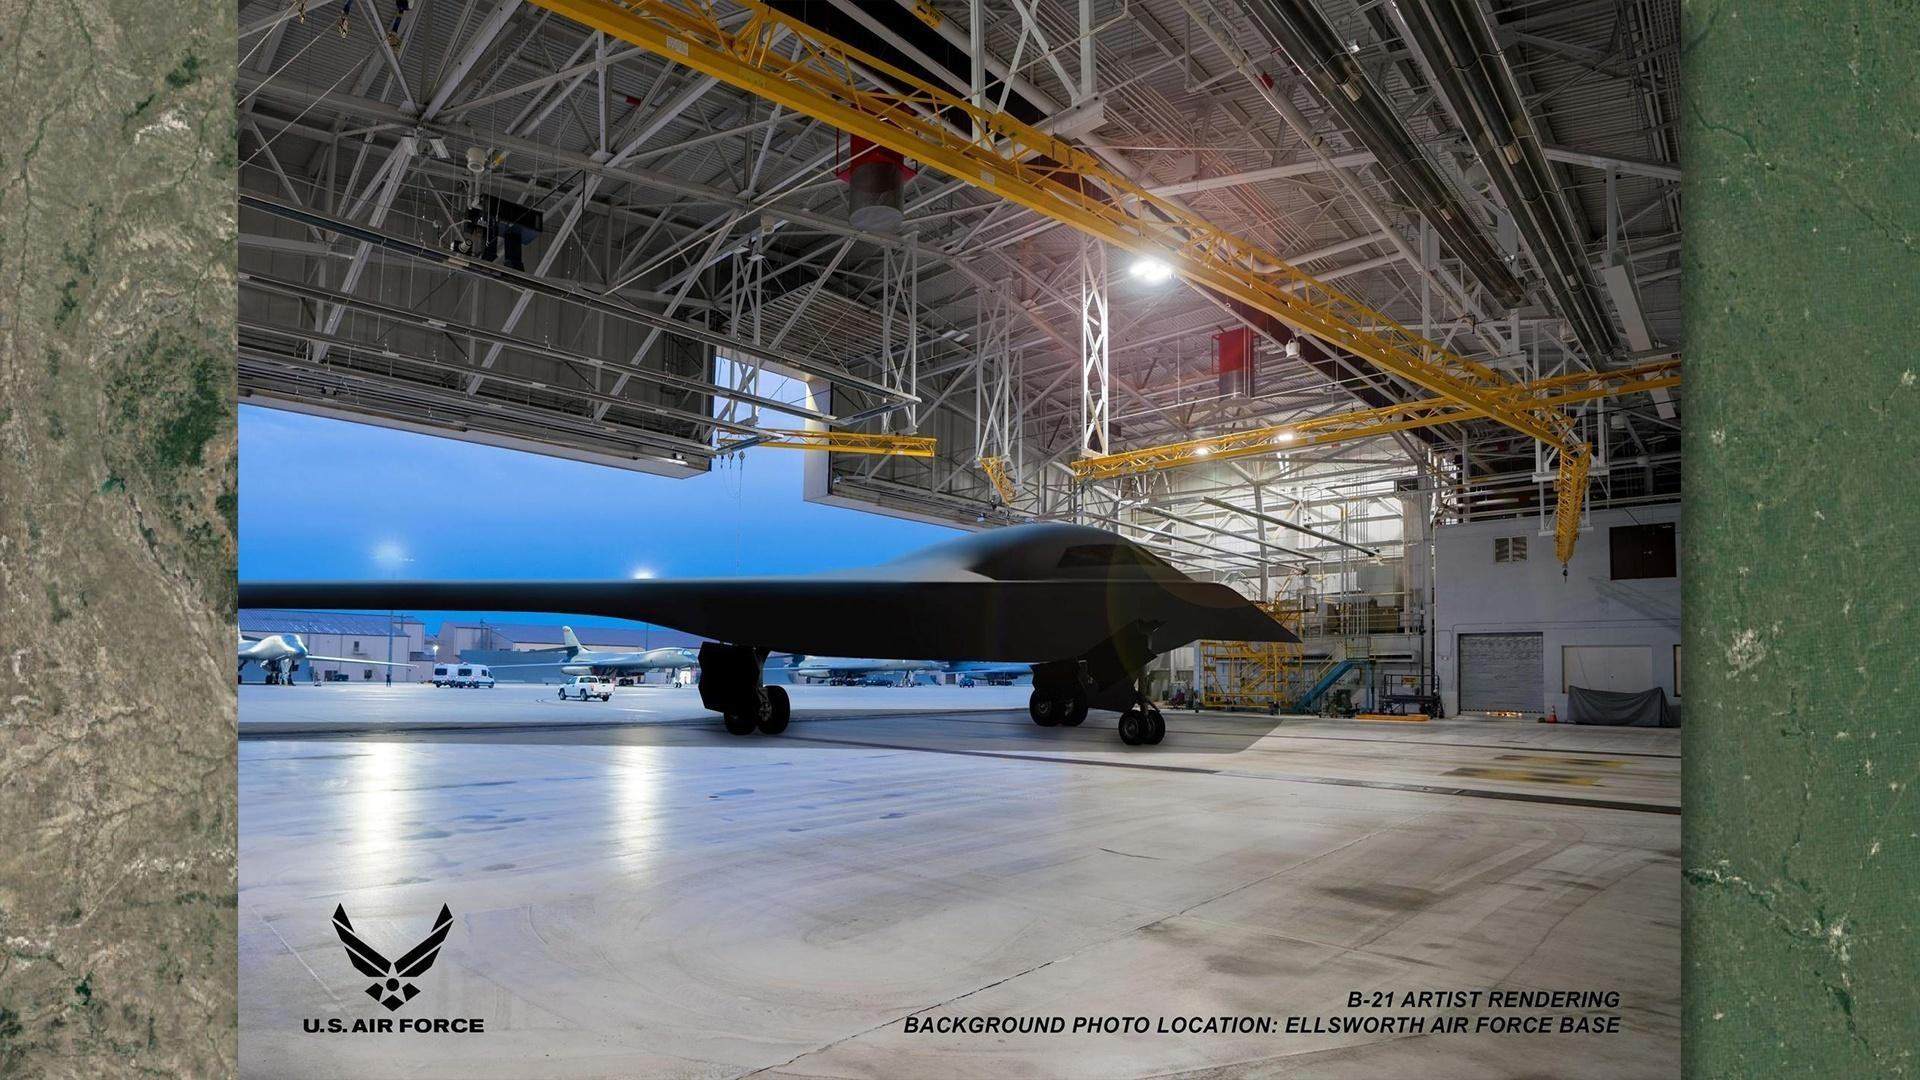 An artist's rendering of a B-21 Raider at Ellsworth Air Force Base.